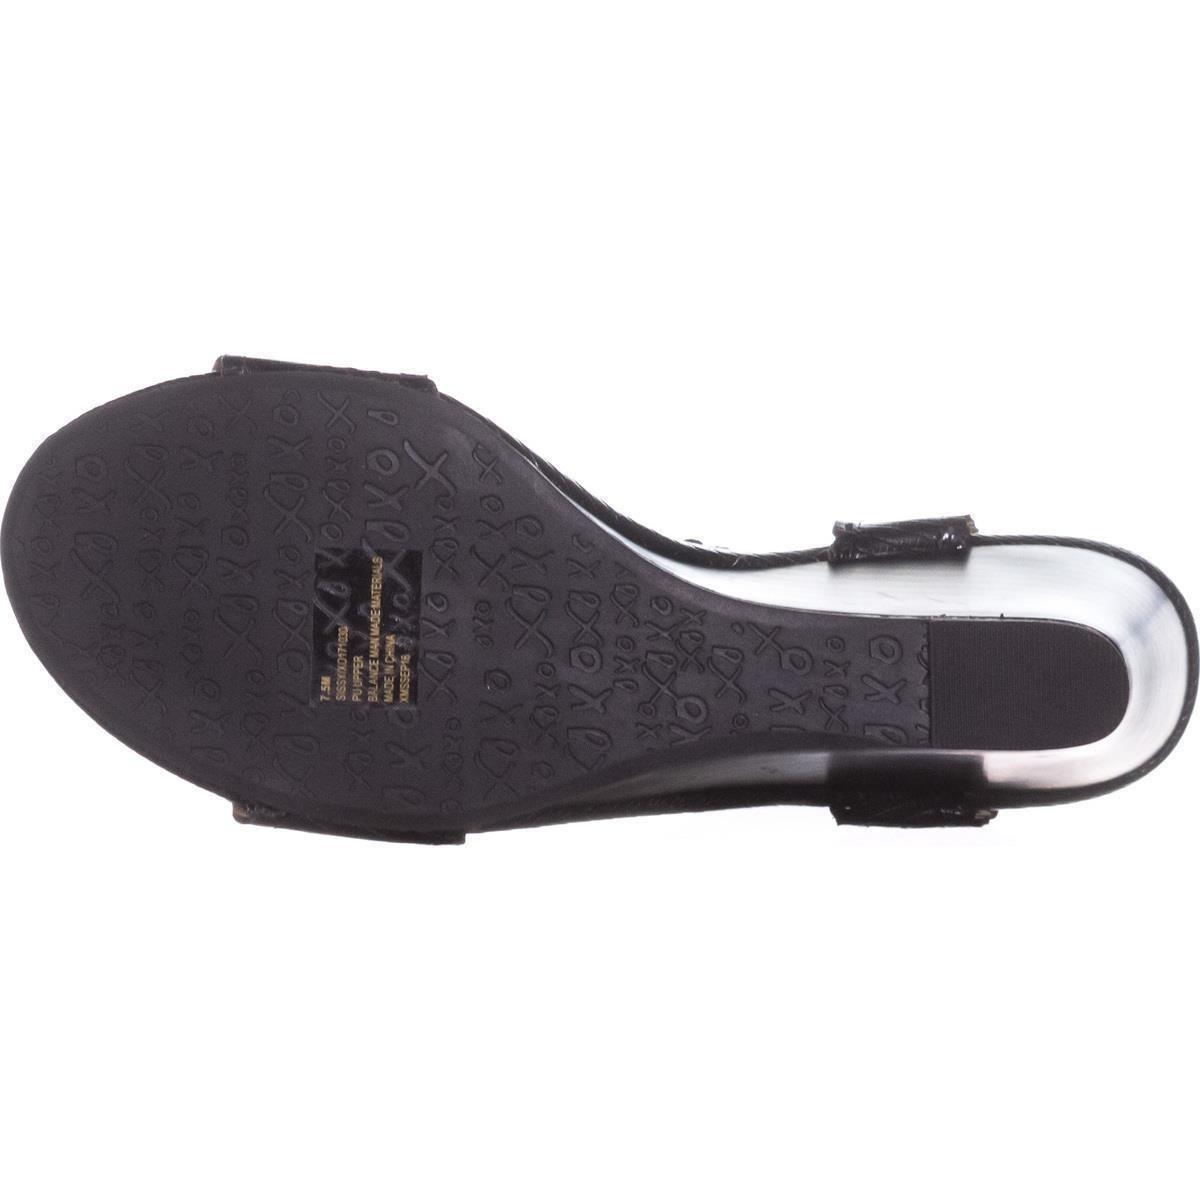 XOXO XOXO XOXO Frauen Sissy Offener Zeh Leger Sandalen mit Keilabsatz  schwarz b6621d